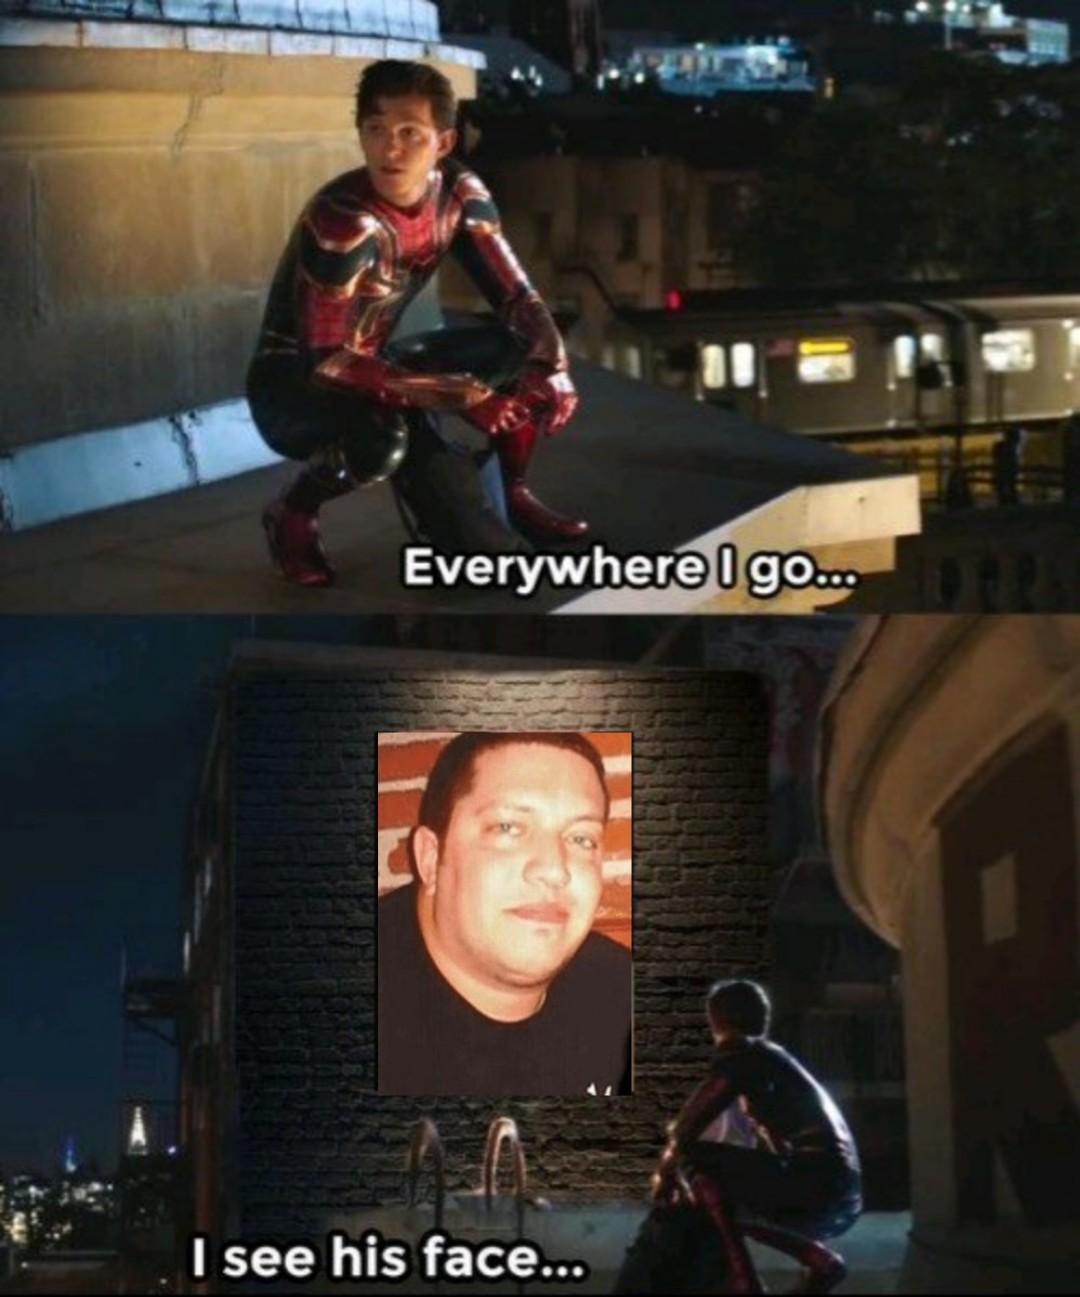 How do I make a title? - meme